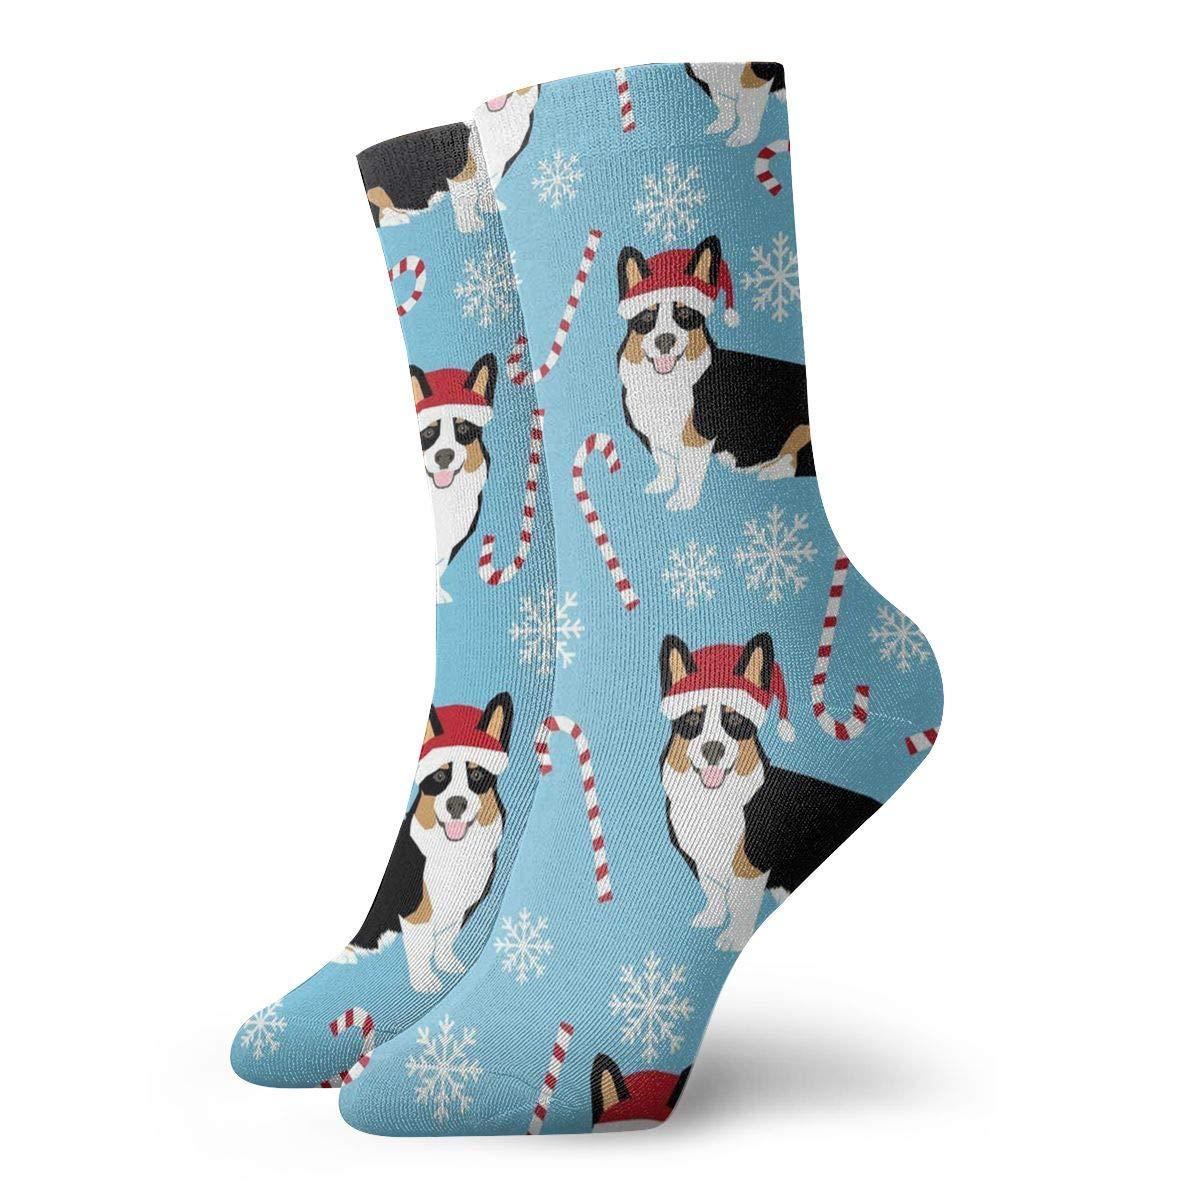 Corgi Walking Stick Candy Unisex Funny Casual Crew Socks Athletic Socks For Boys Girls Kids Teenagers